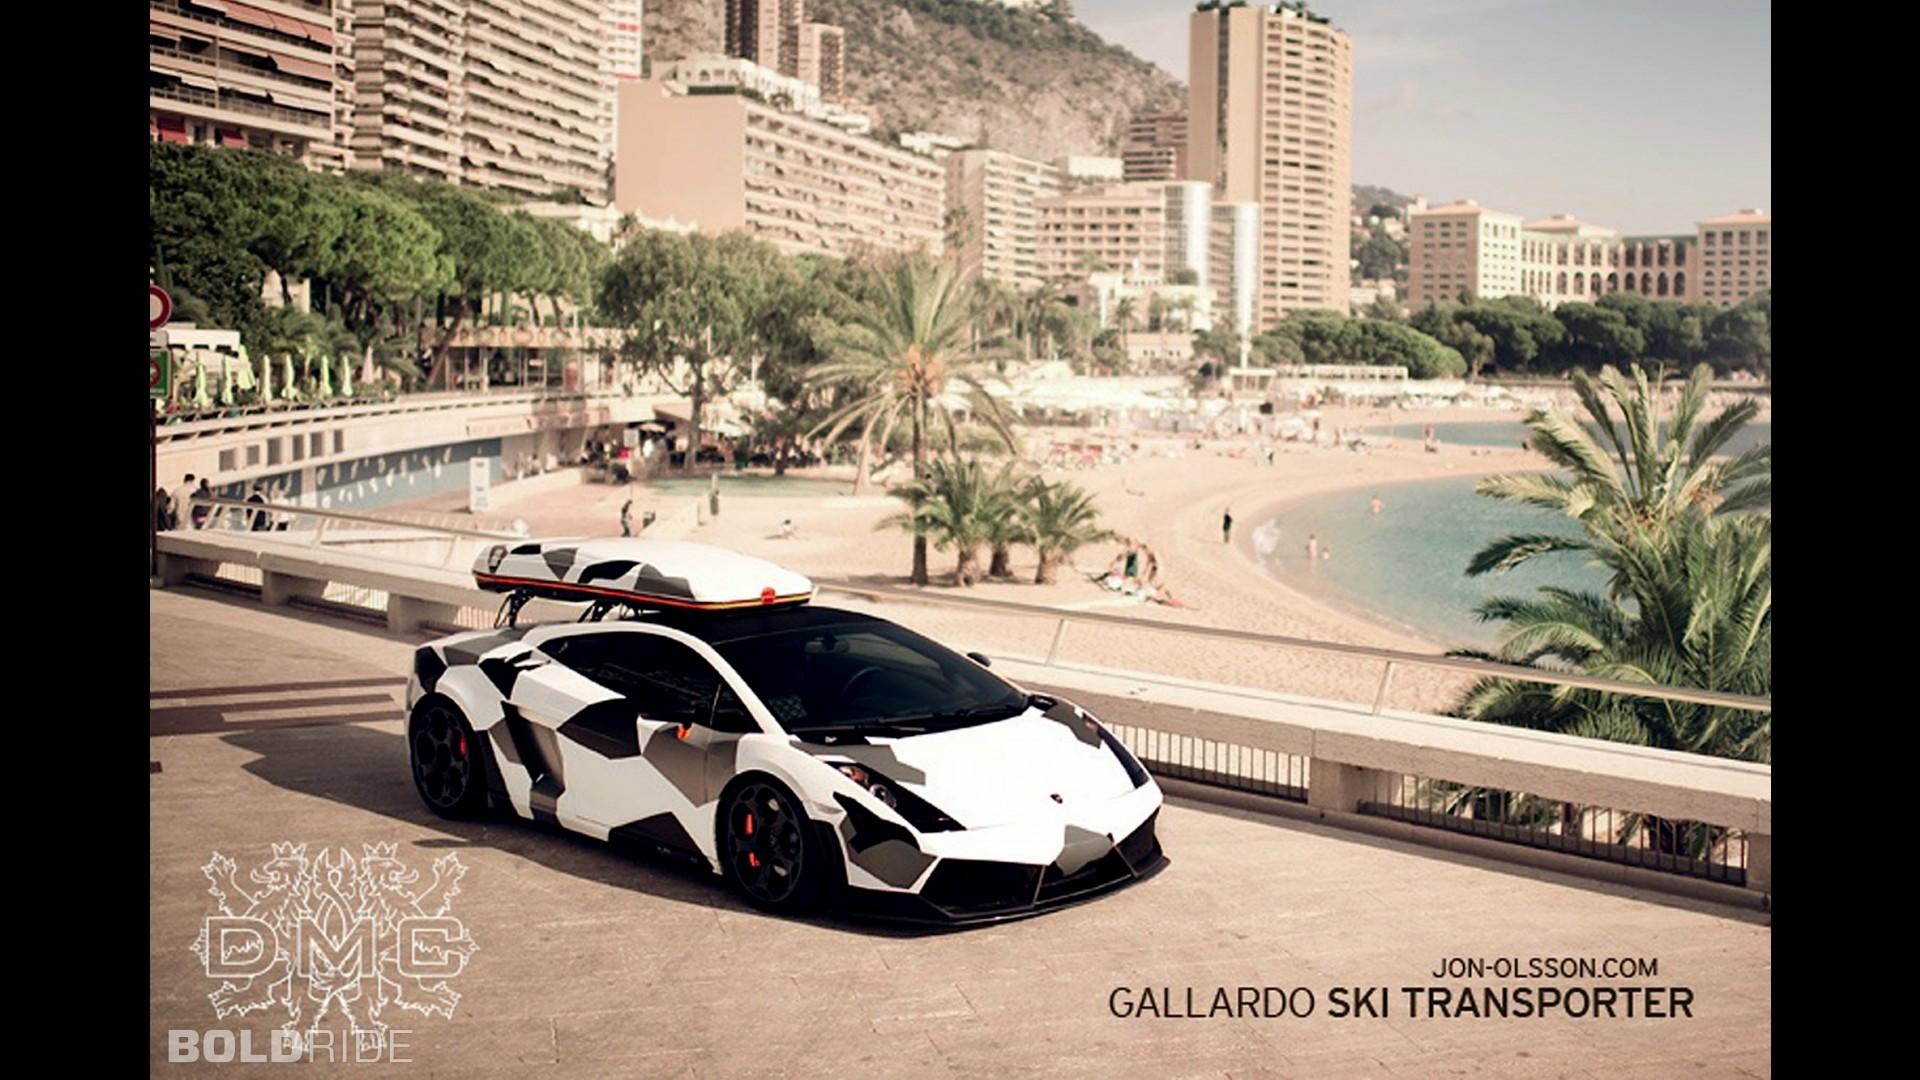 DMC Lamborghini Gallardo Ski Transporter